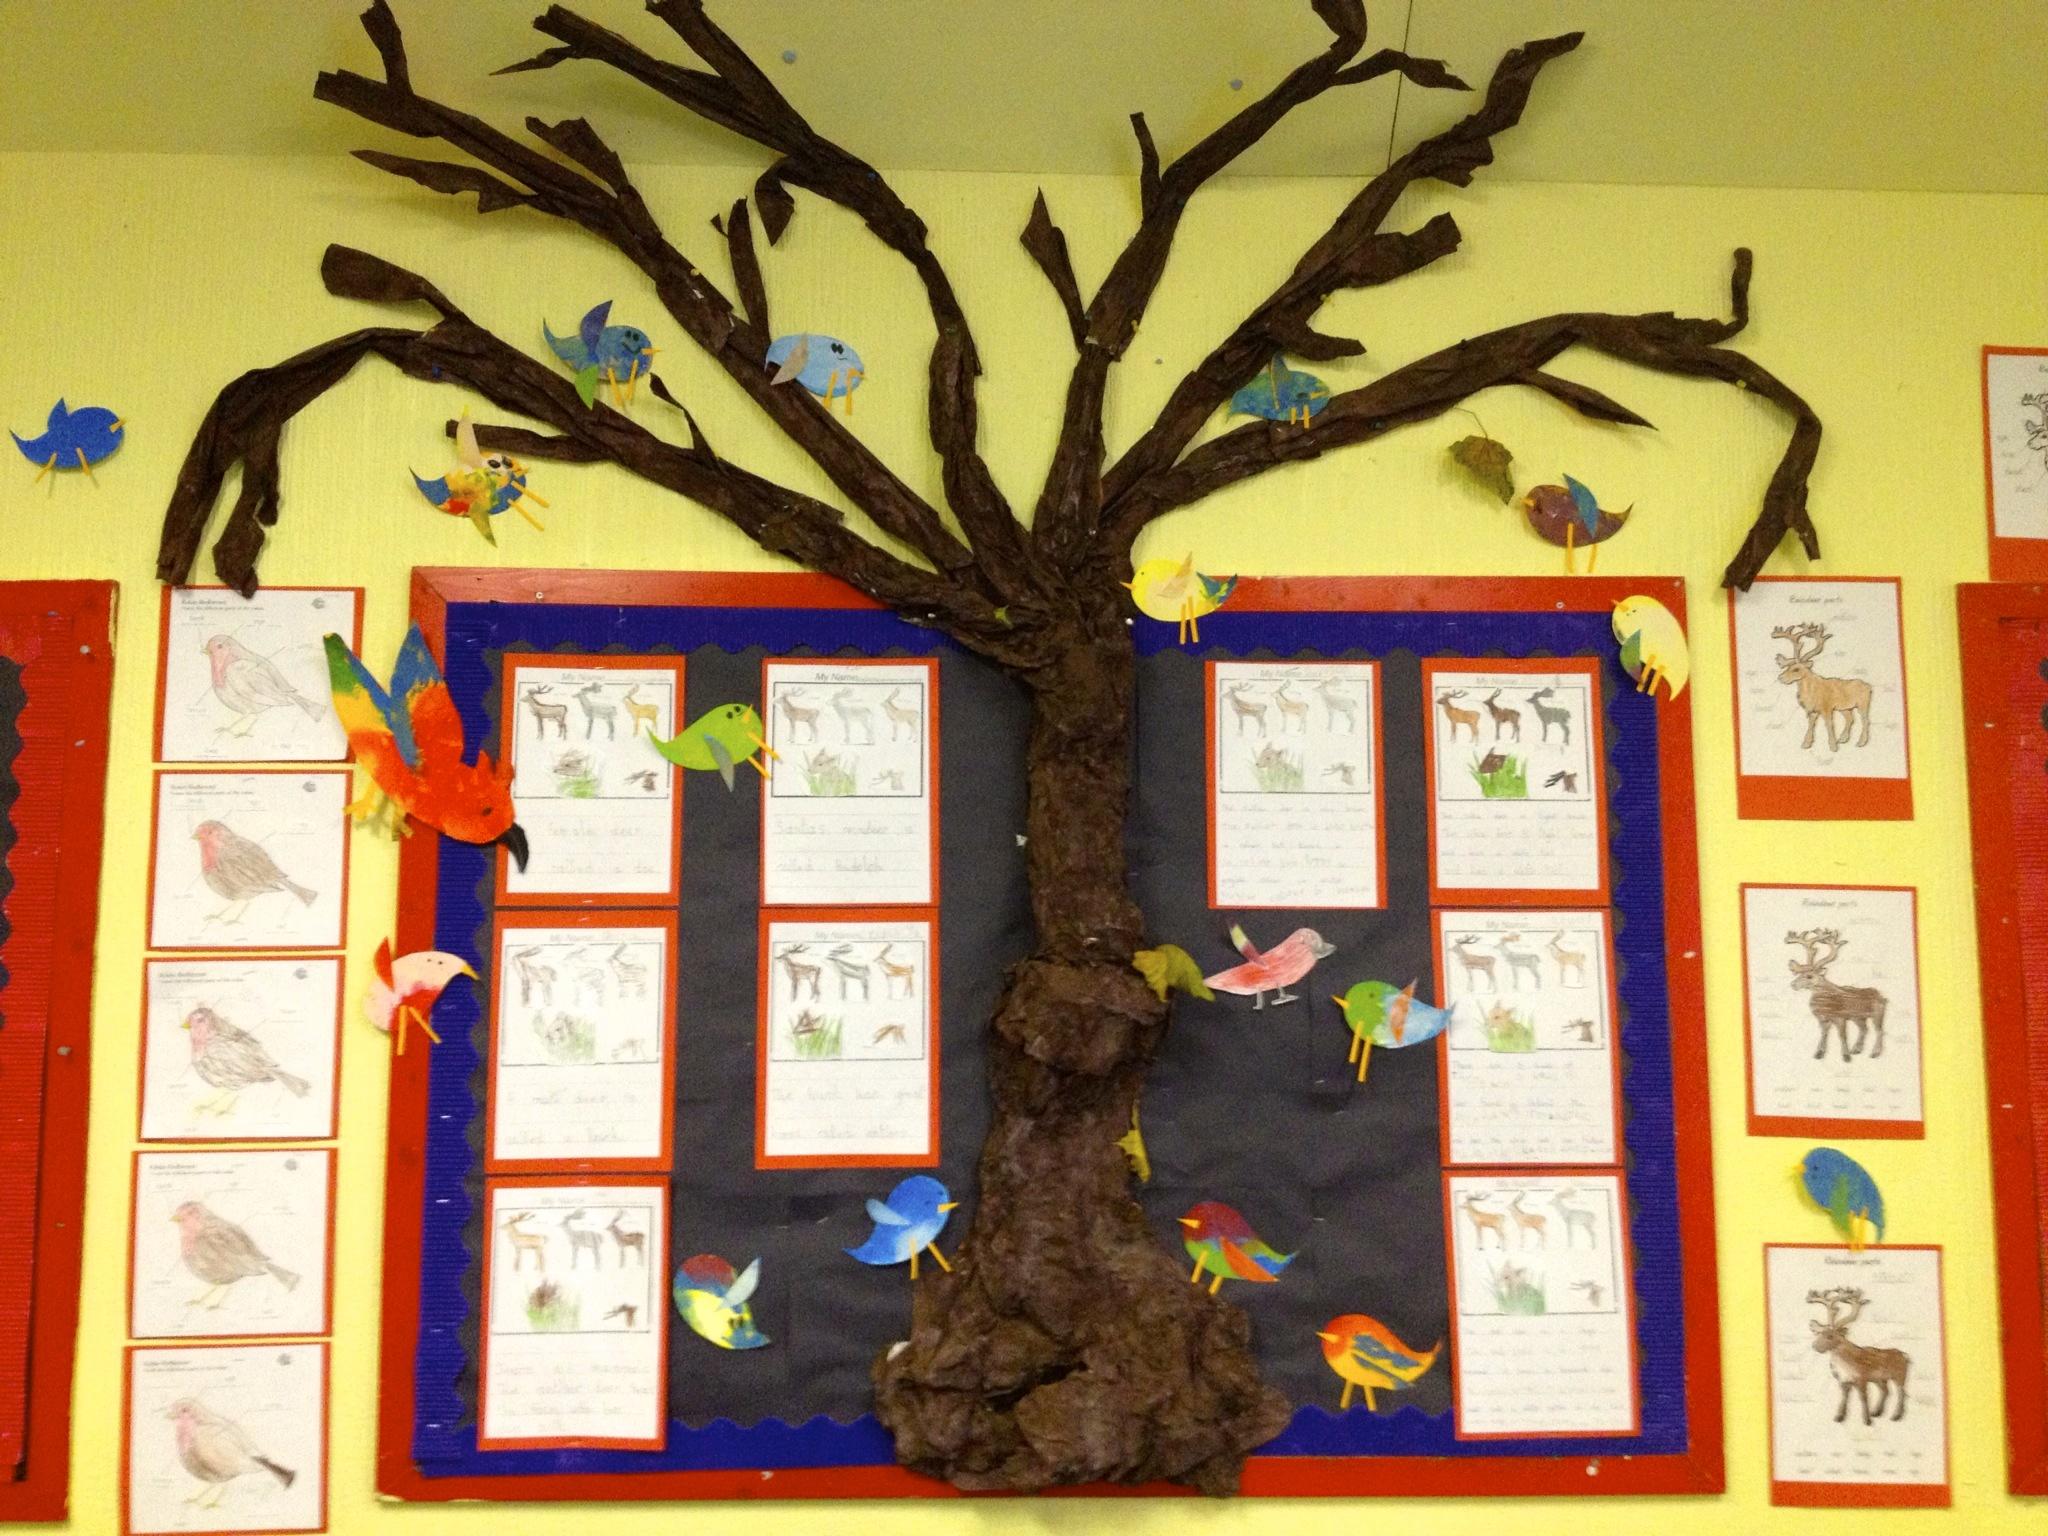 Montessori Classroom Wall Decoration : December hedley park montessori school